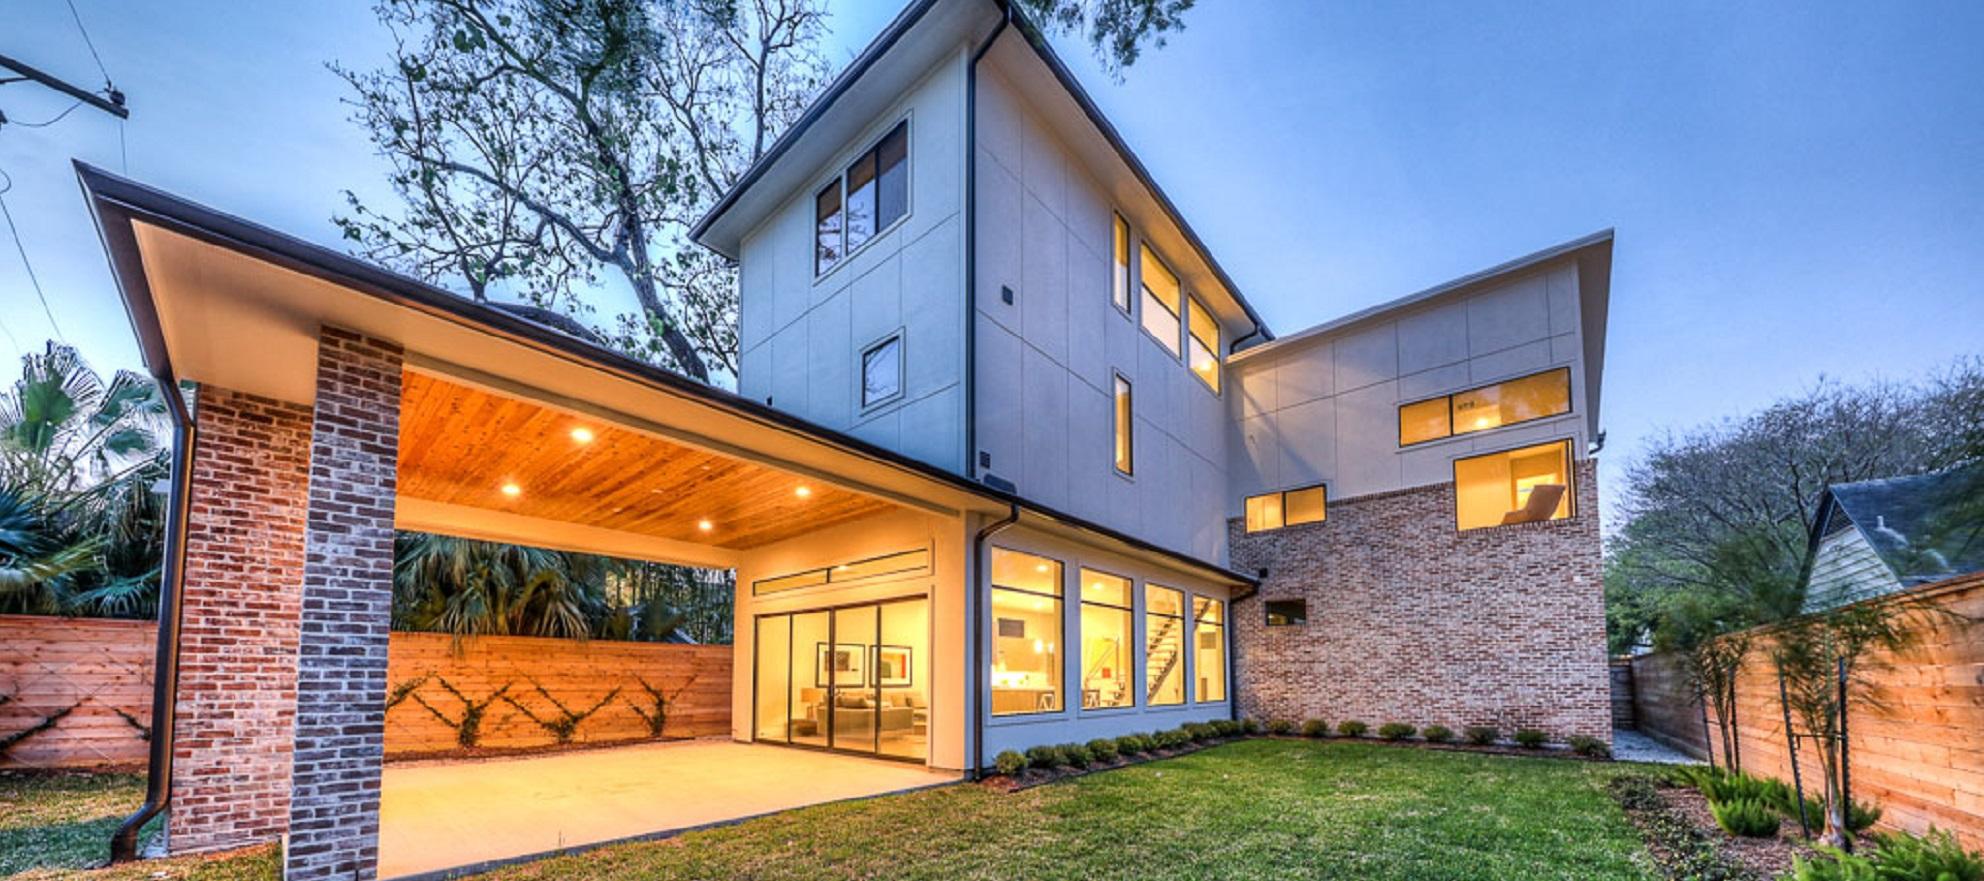 Luxury listing: custom-designed industrial and modern